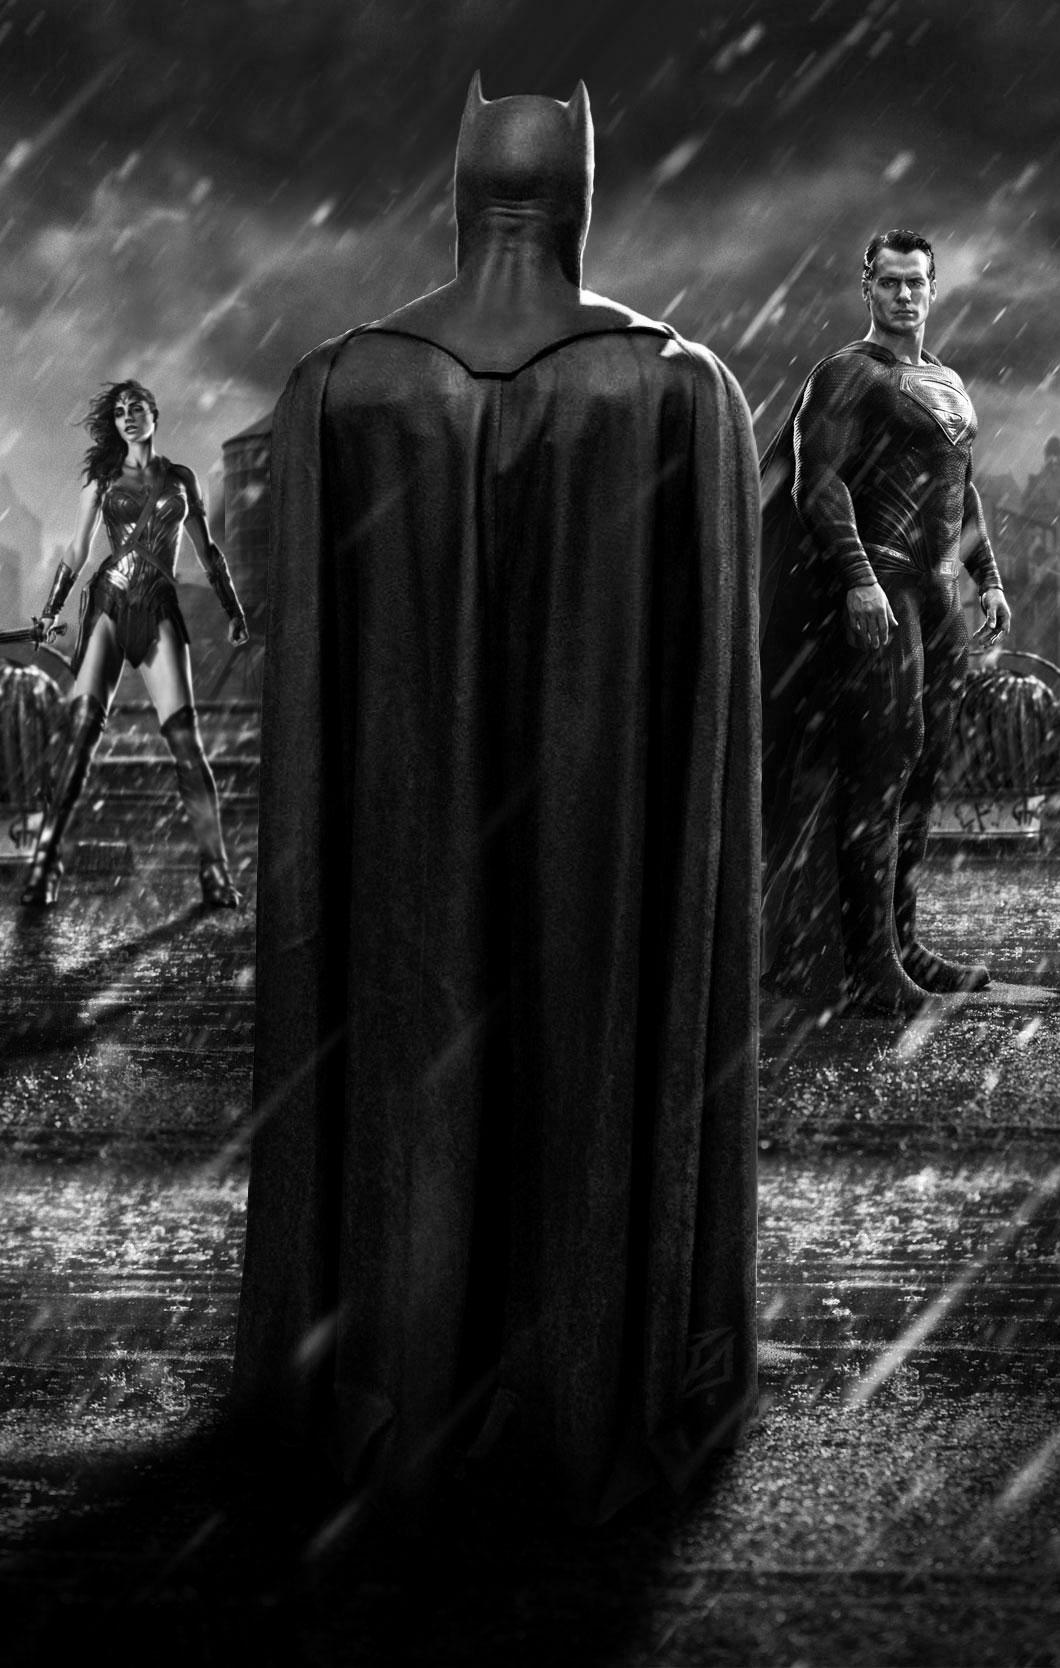 http://fc07.deviantart.net/fs71/f/2014/268/a/c/batman_v_superman_dawn_of_justice_by_patokali-d80it7p.jpg